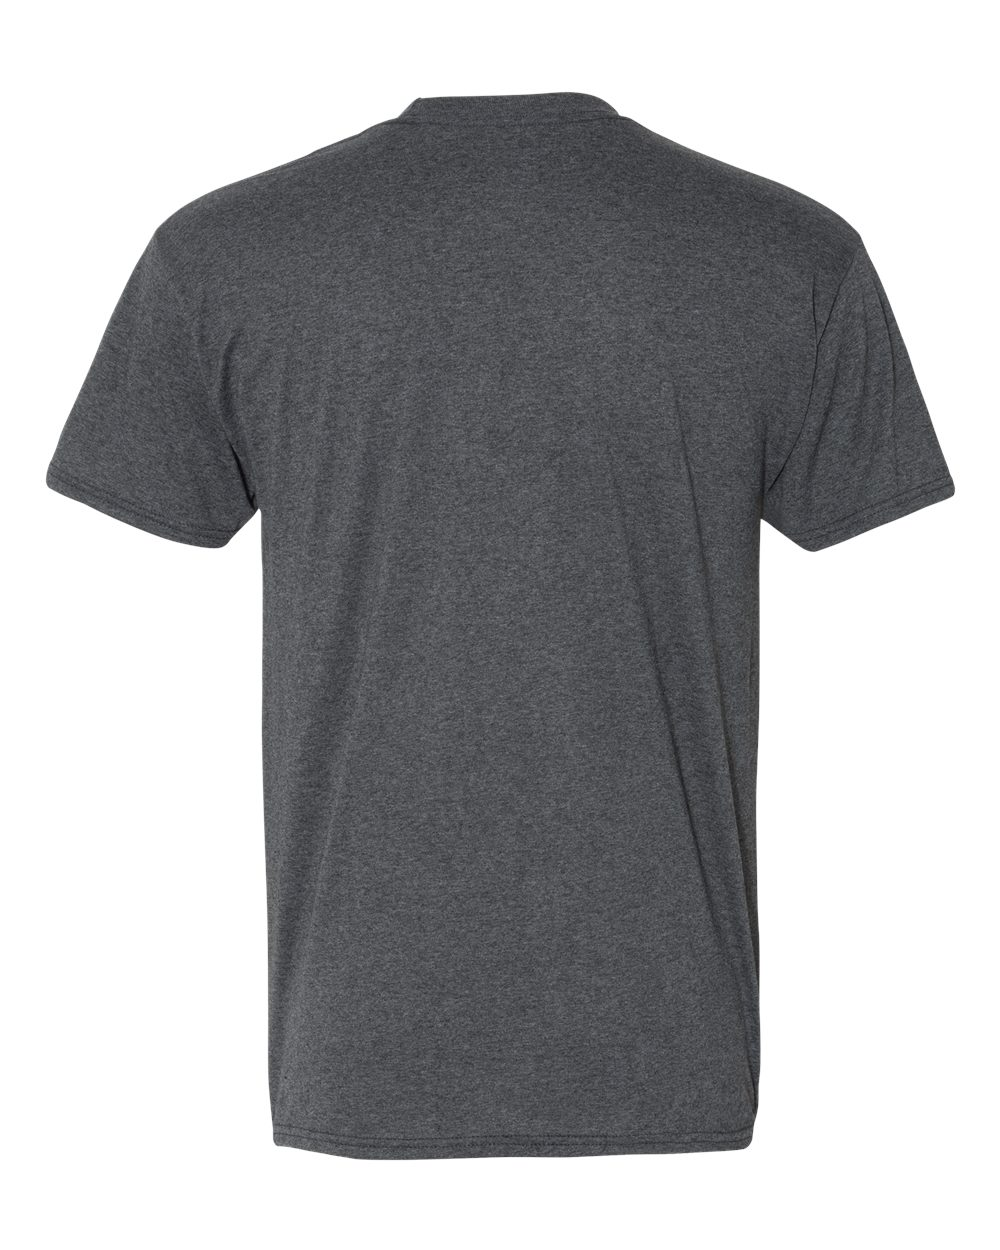 Hanes-Men-039-s-X-Temp-Triblend-T-Shirt-With-Fresh-Iq-42TB-S-3XL thumbnail 30